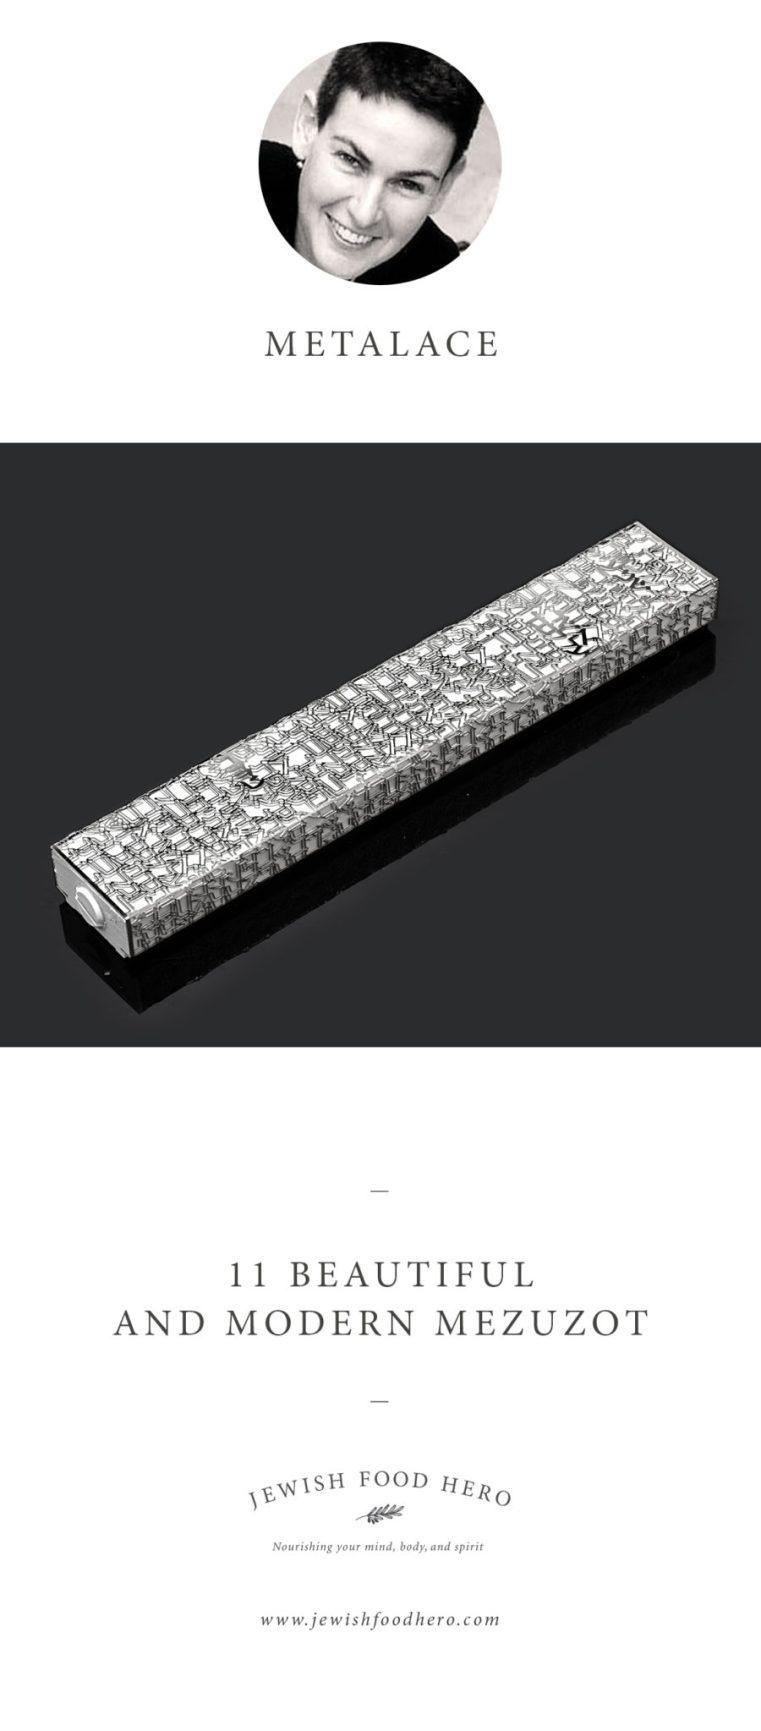 Metalace, Modern Mezuzot